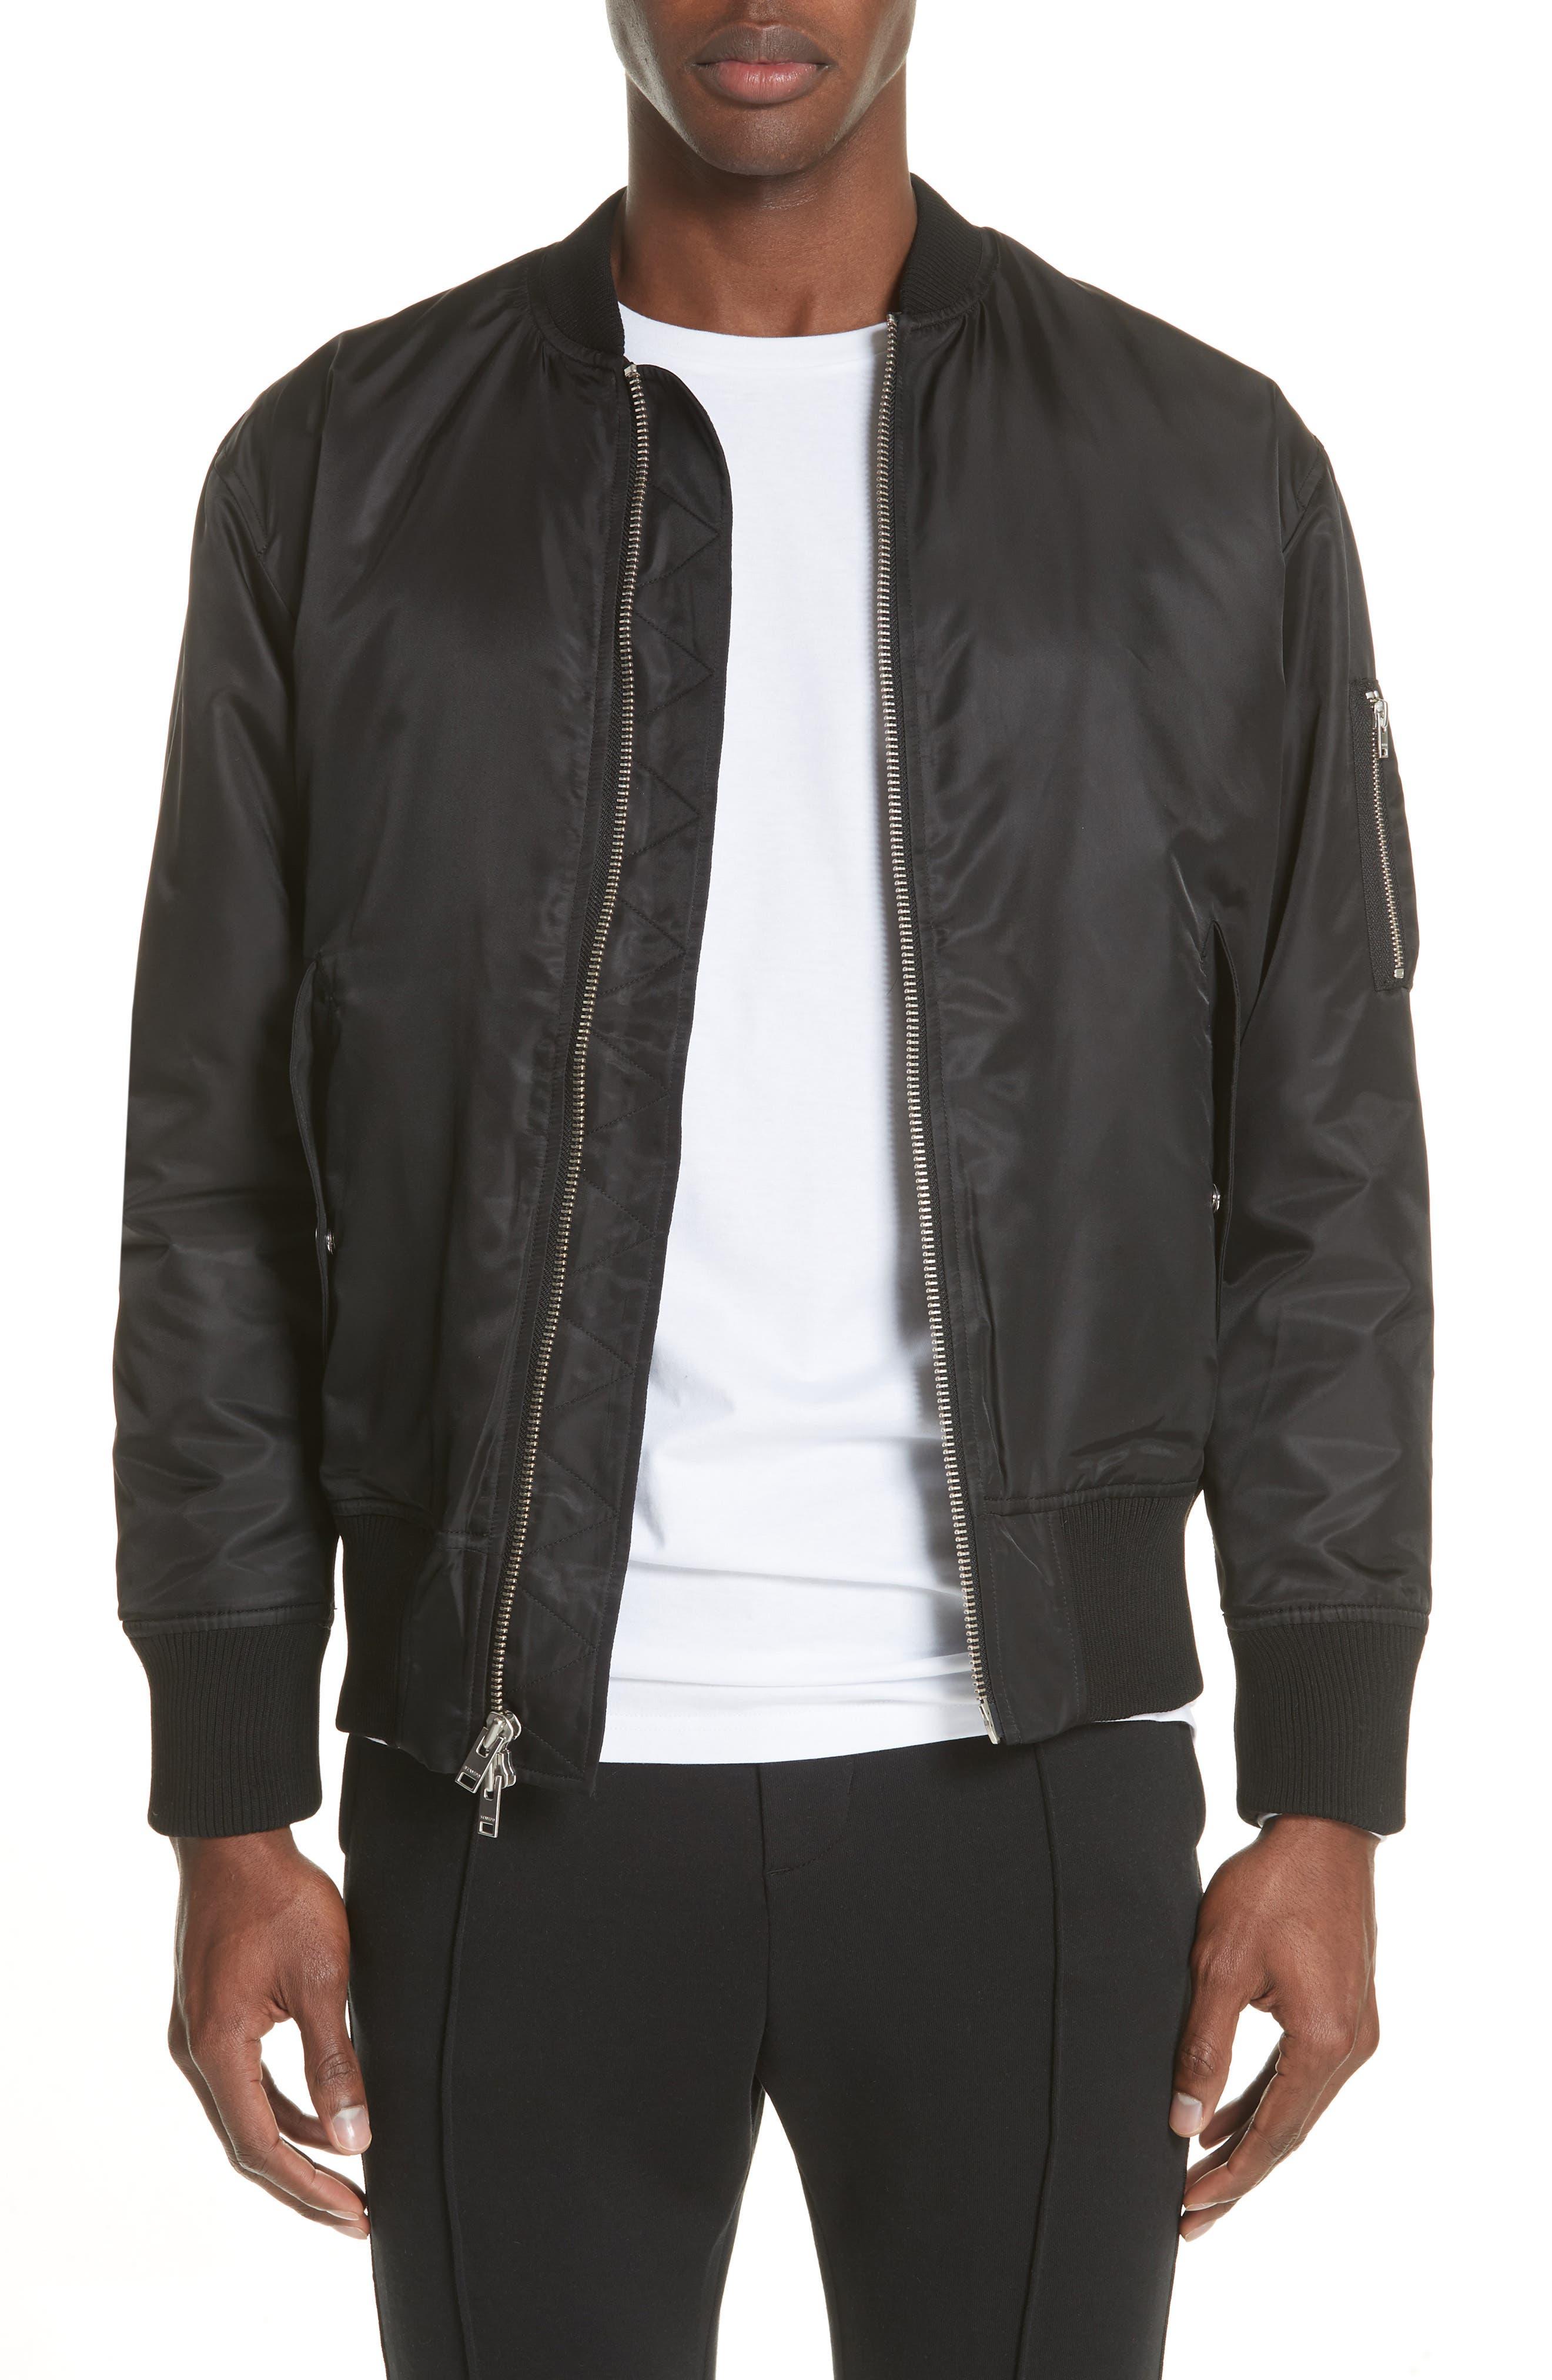 Van Ness Bomber Jacket,                         Main,                         color, Black